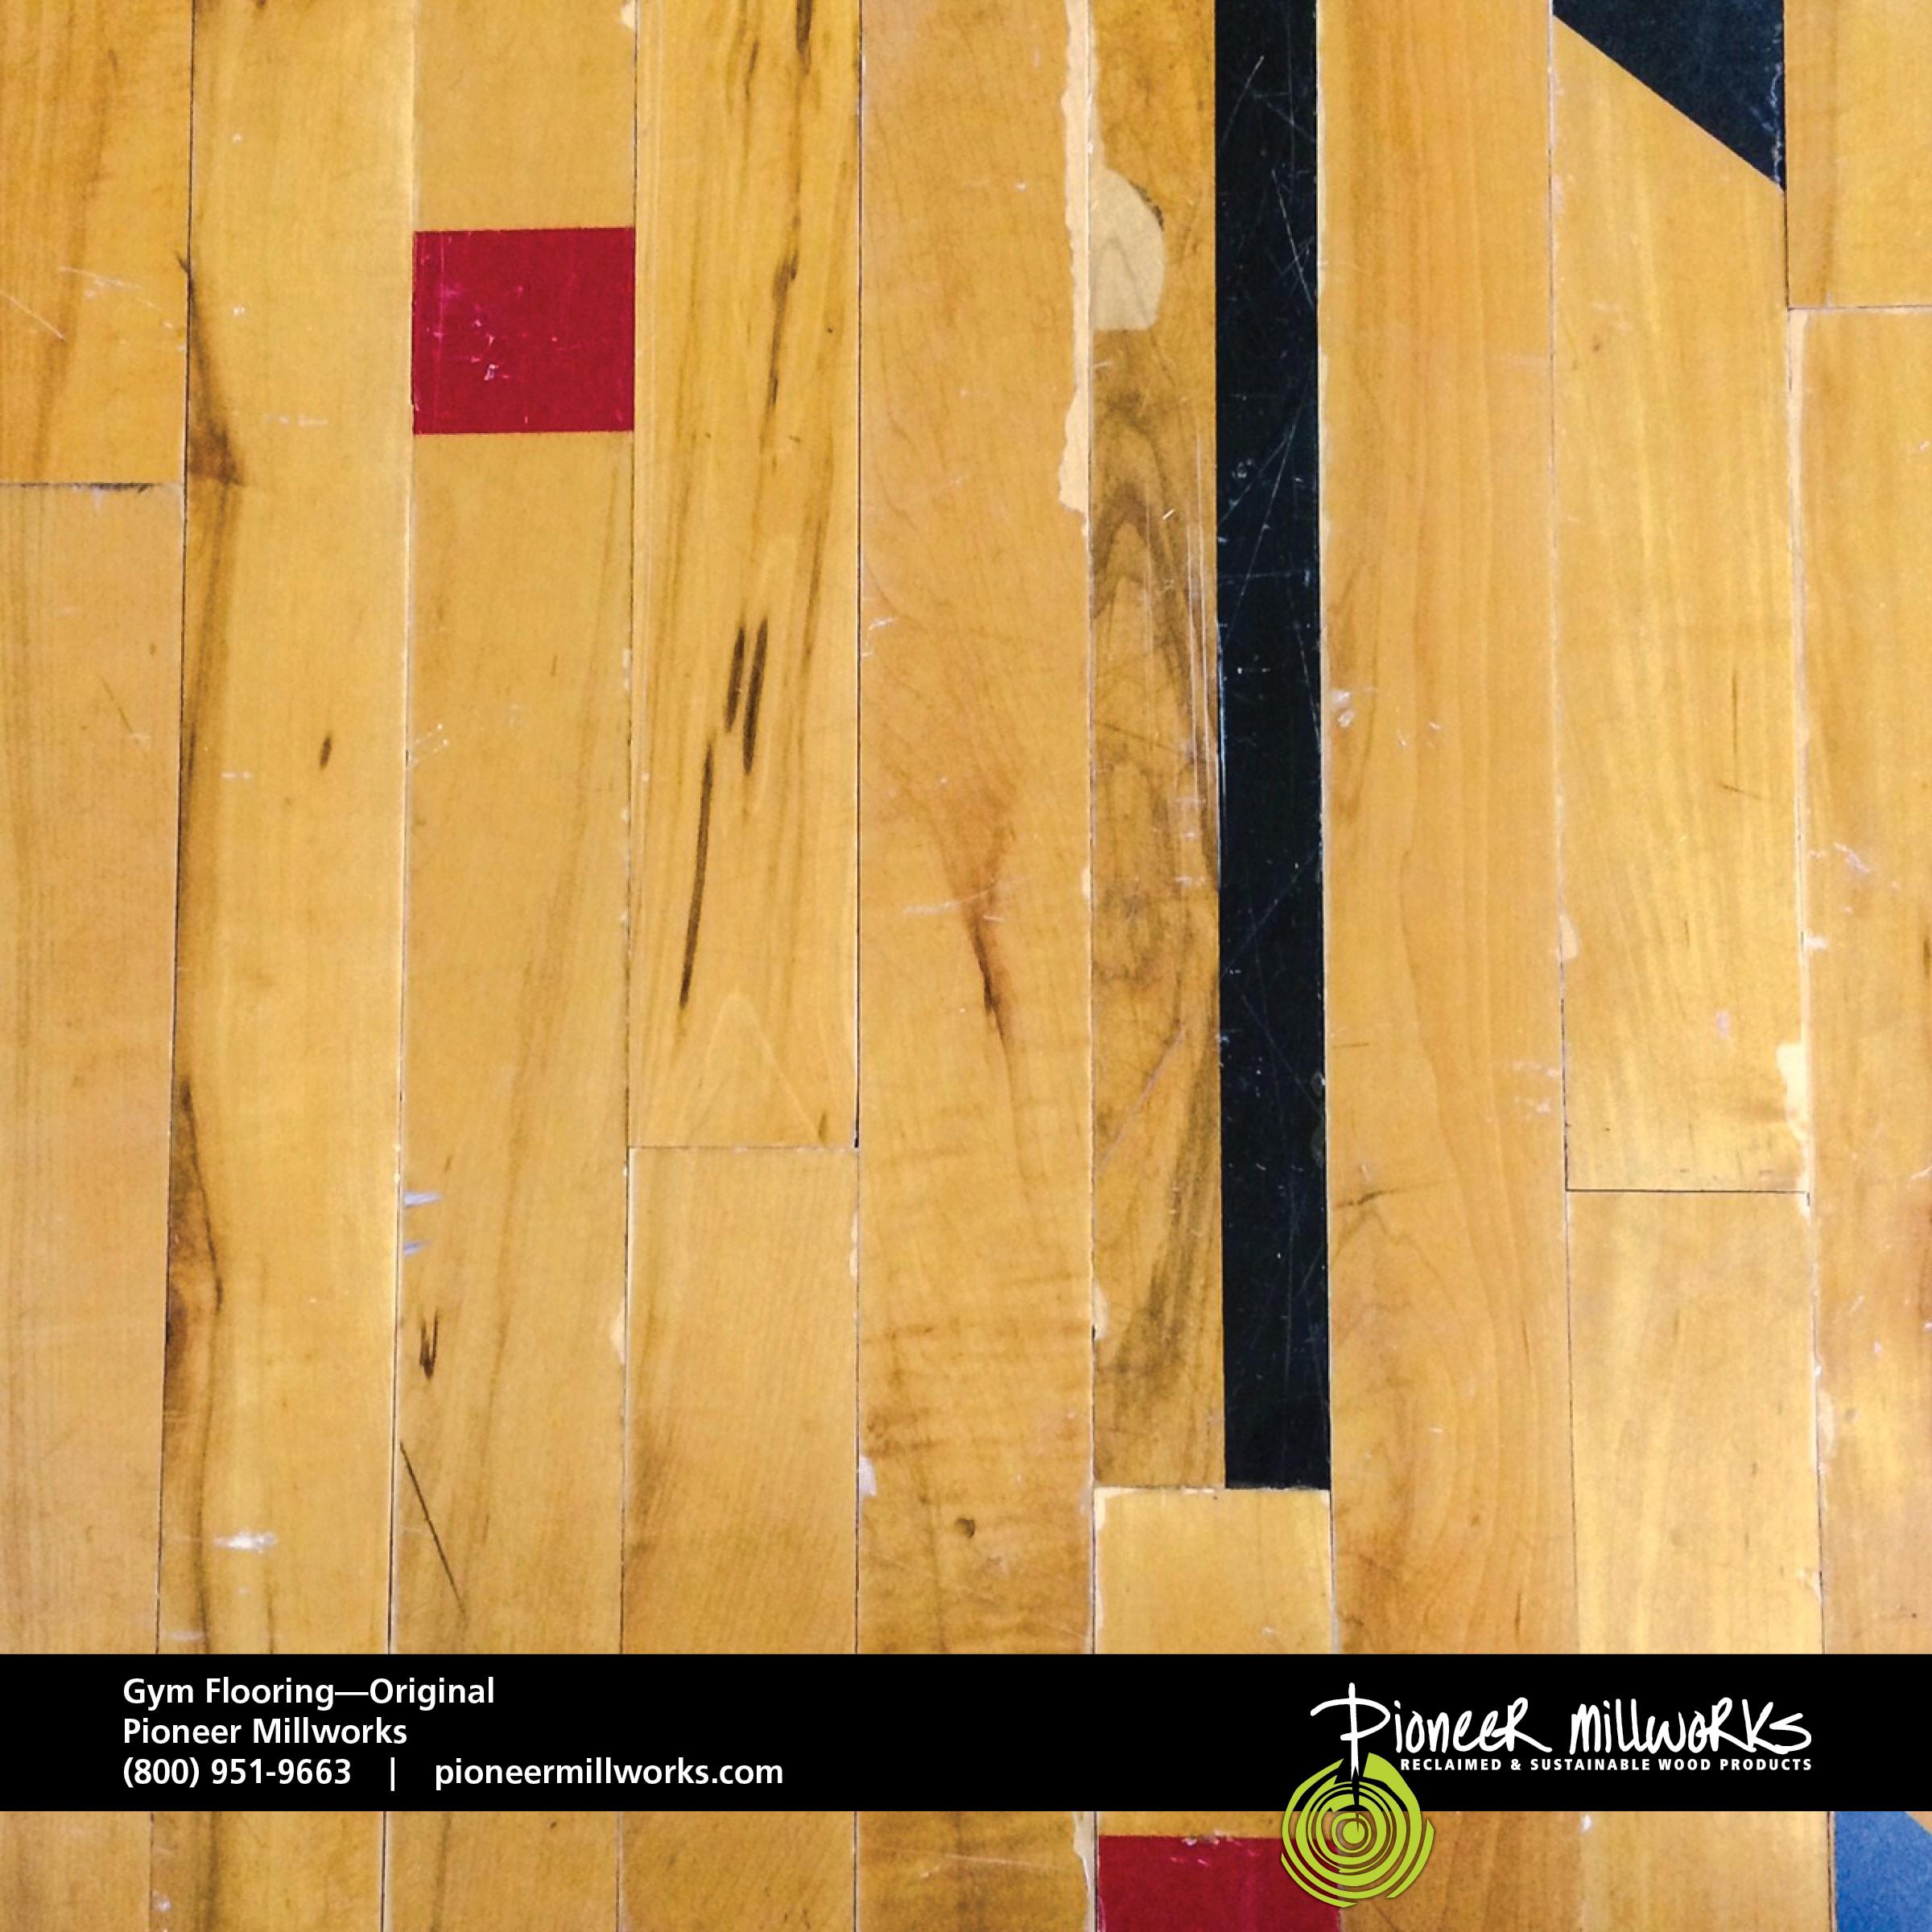 ORIGINAL GYM FLOORING Pioneermillworks - Reclaimed gym flooring for sale